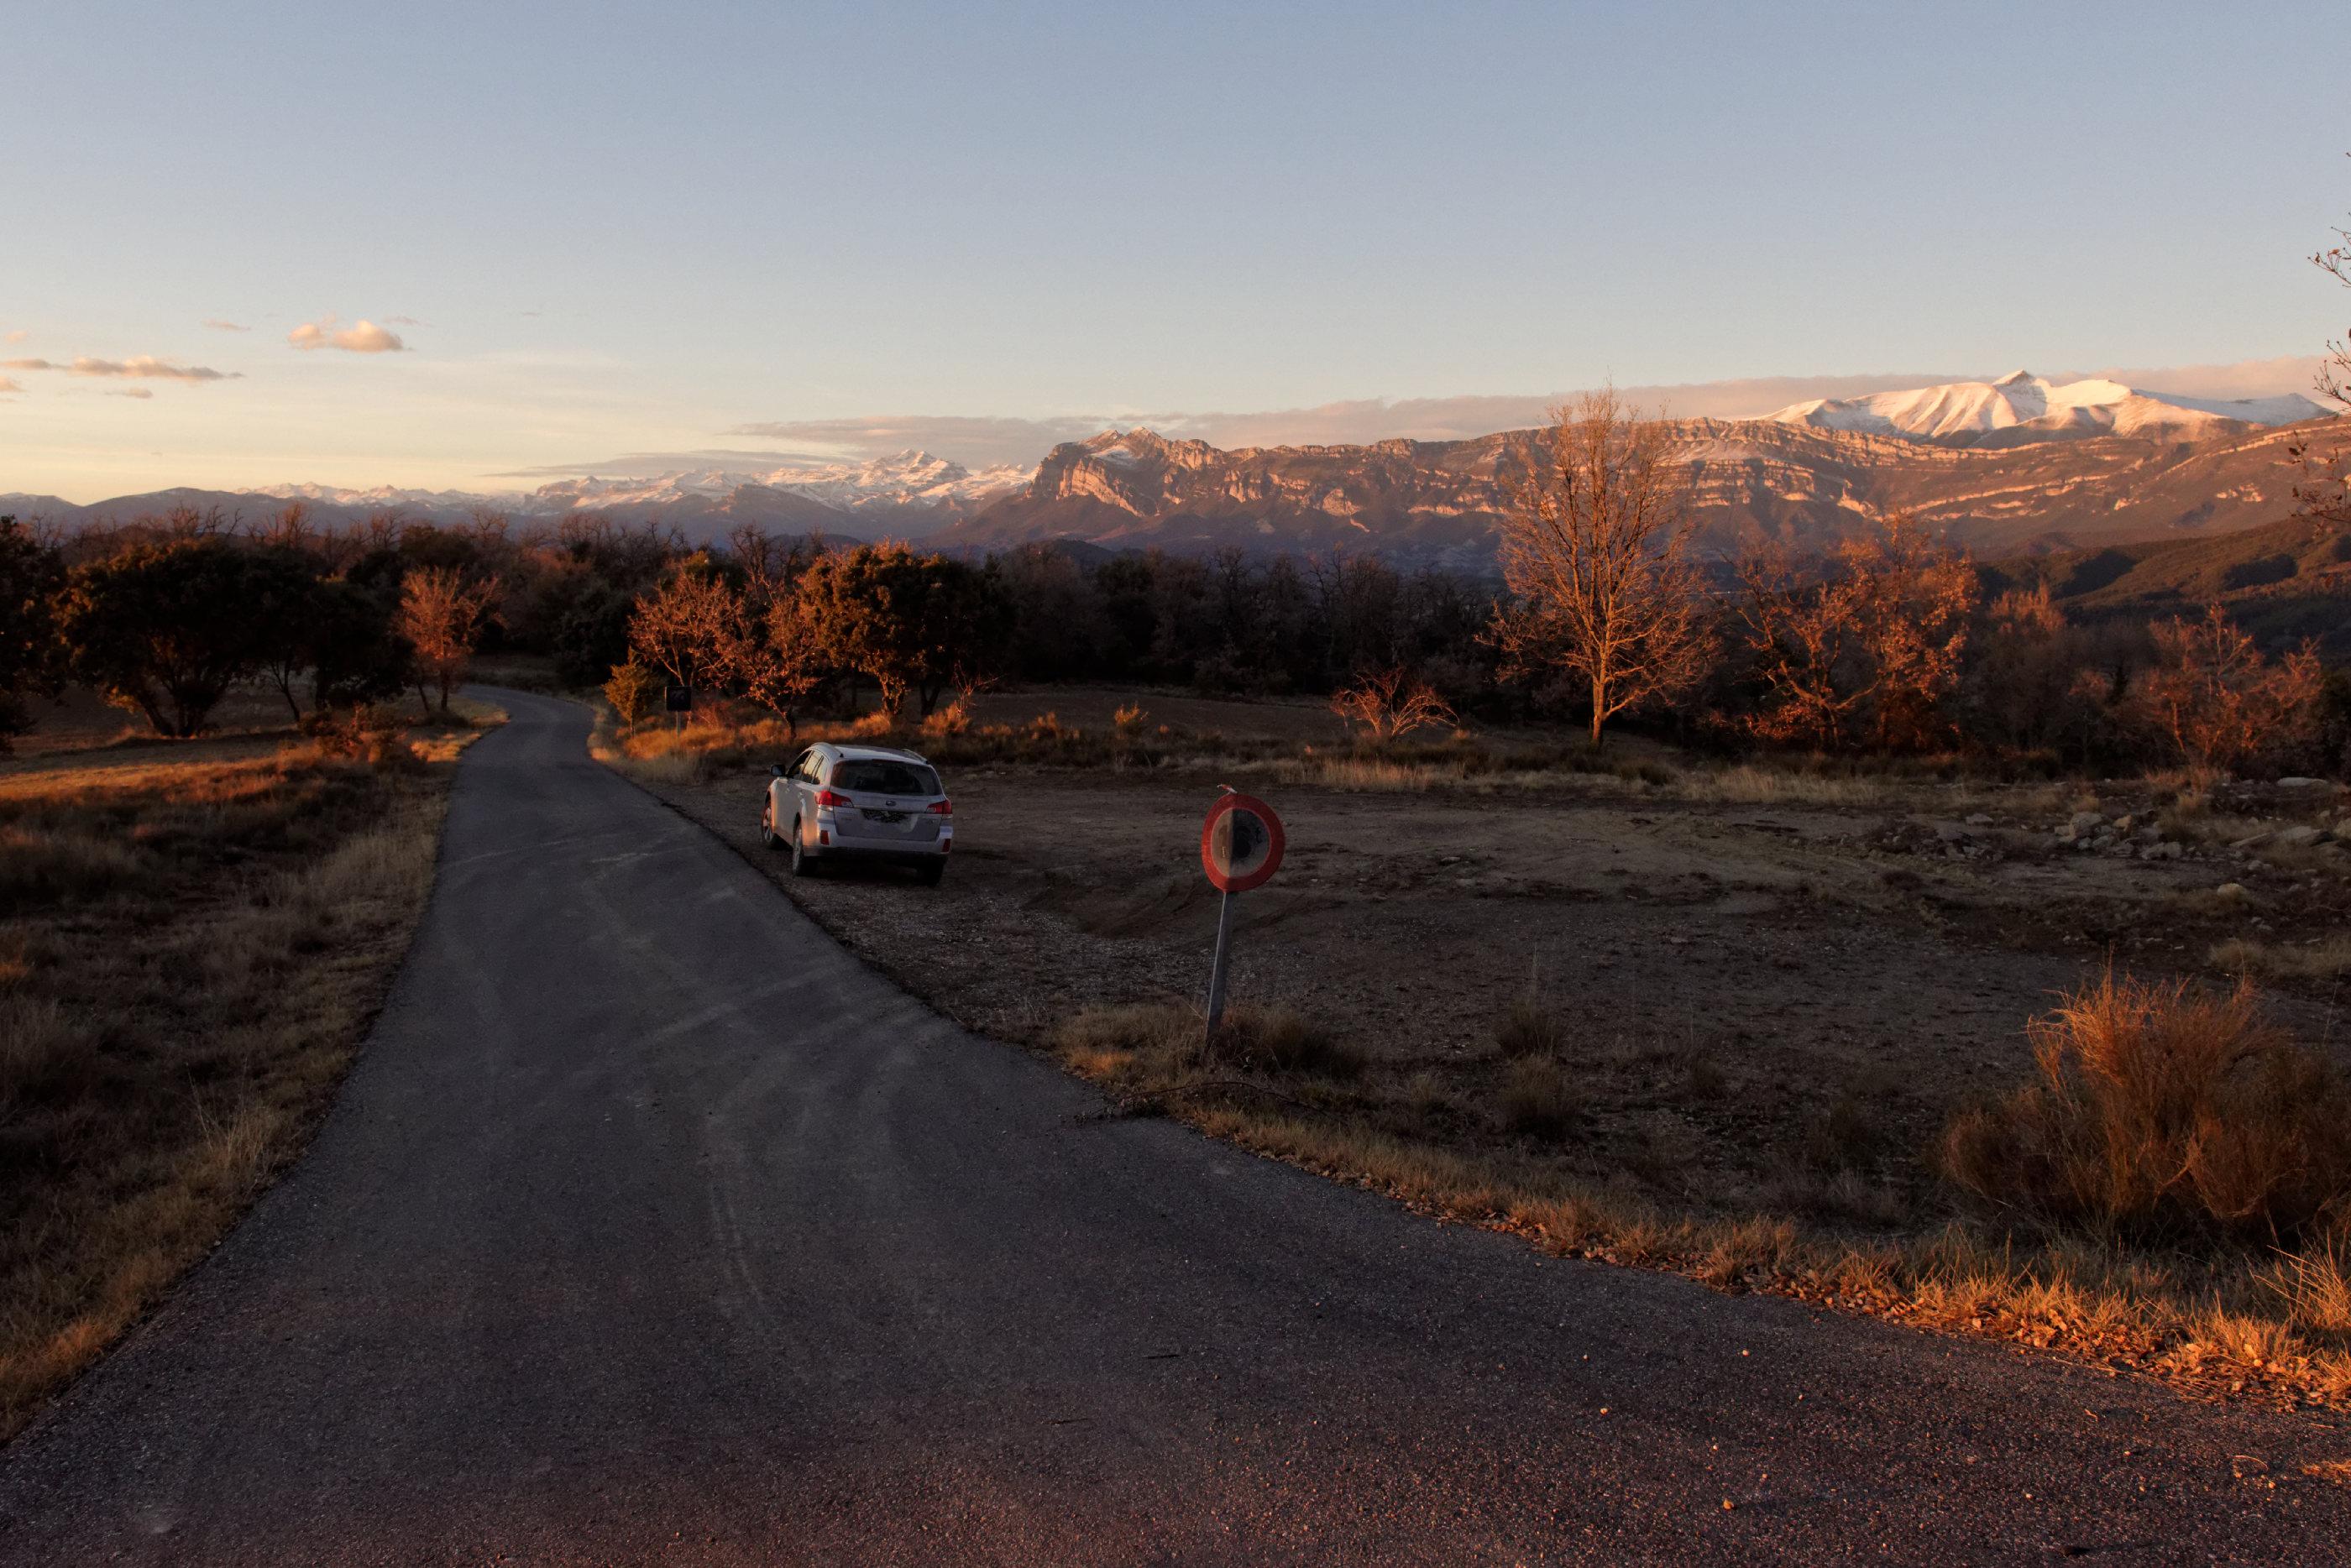 150125-Route de Trillo (Sobrarbe-La Fueva) (17)